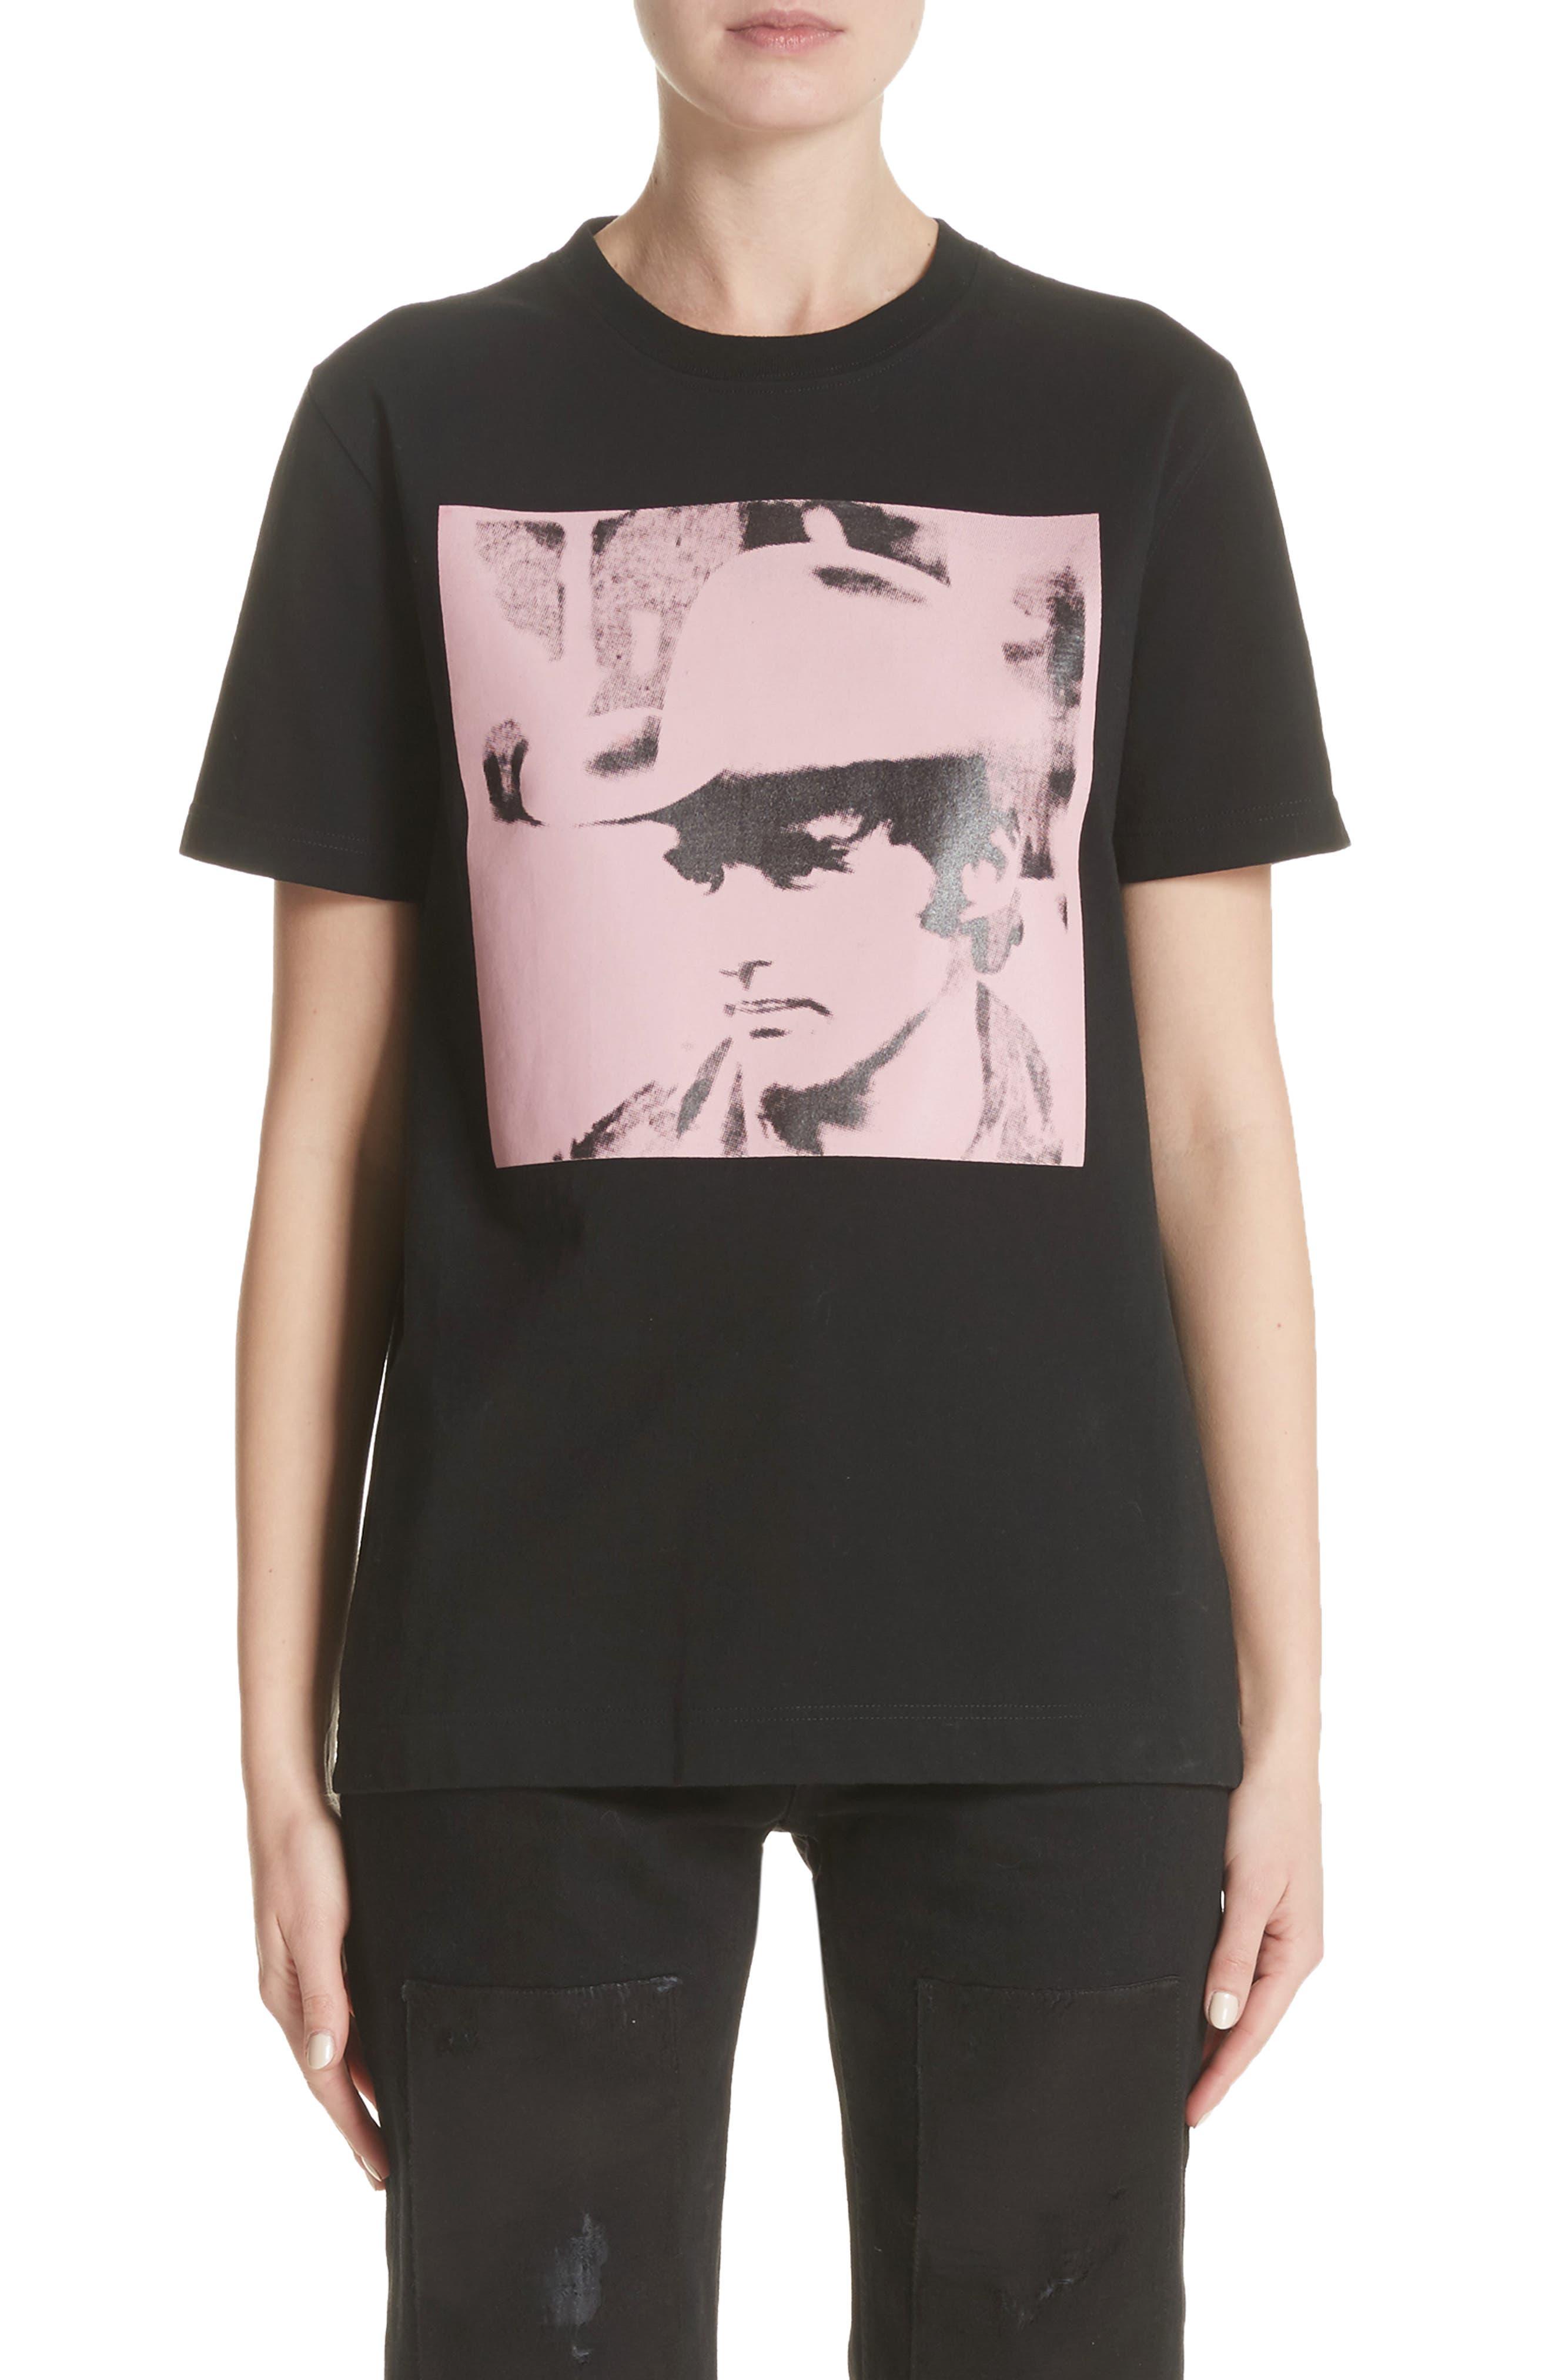 Main Image - CALVIN KLEIN 205W39NYC x Andy Warhol Foundation Dennis Hopper Tee